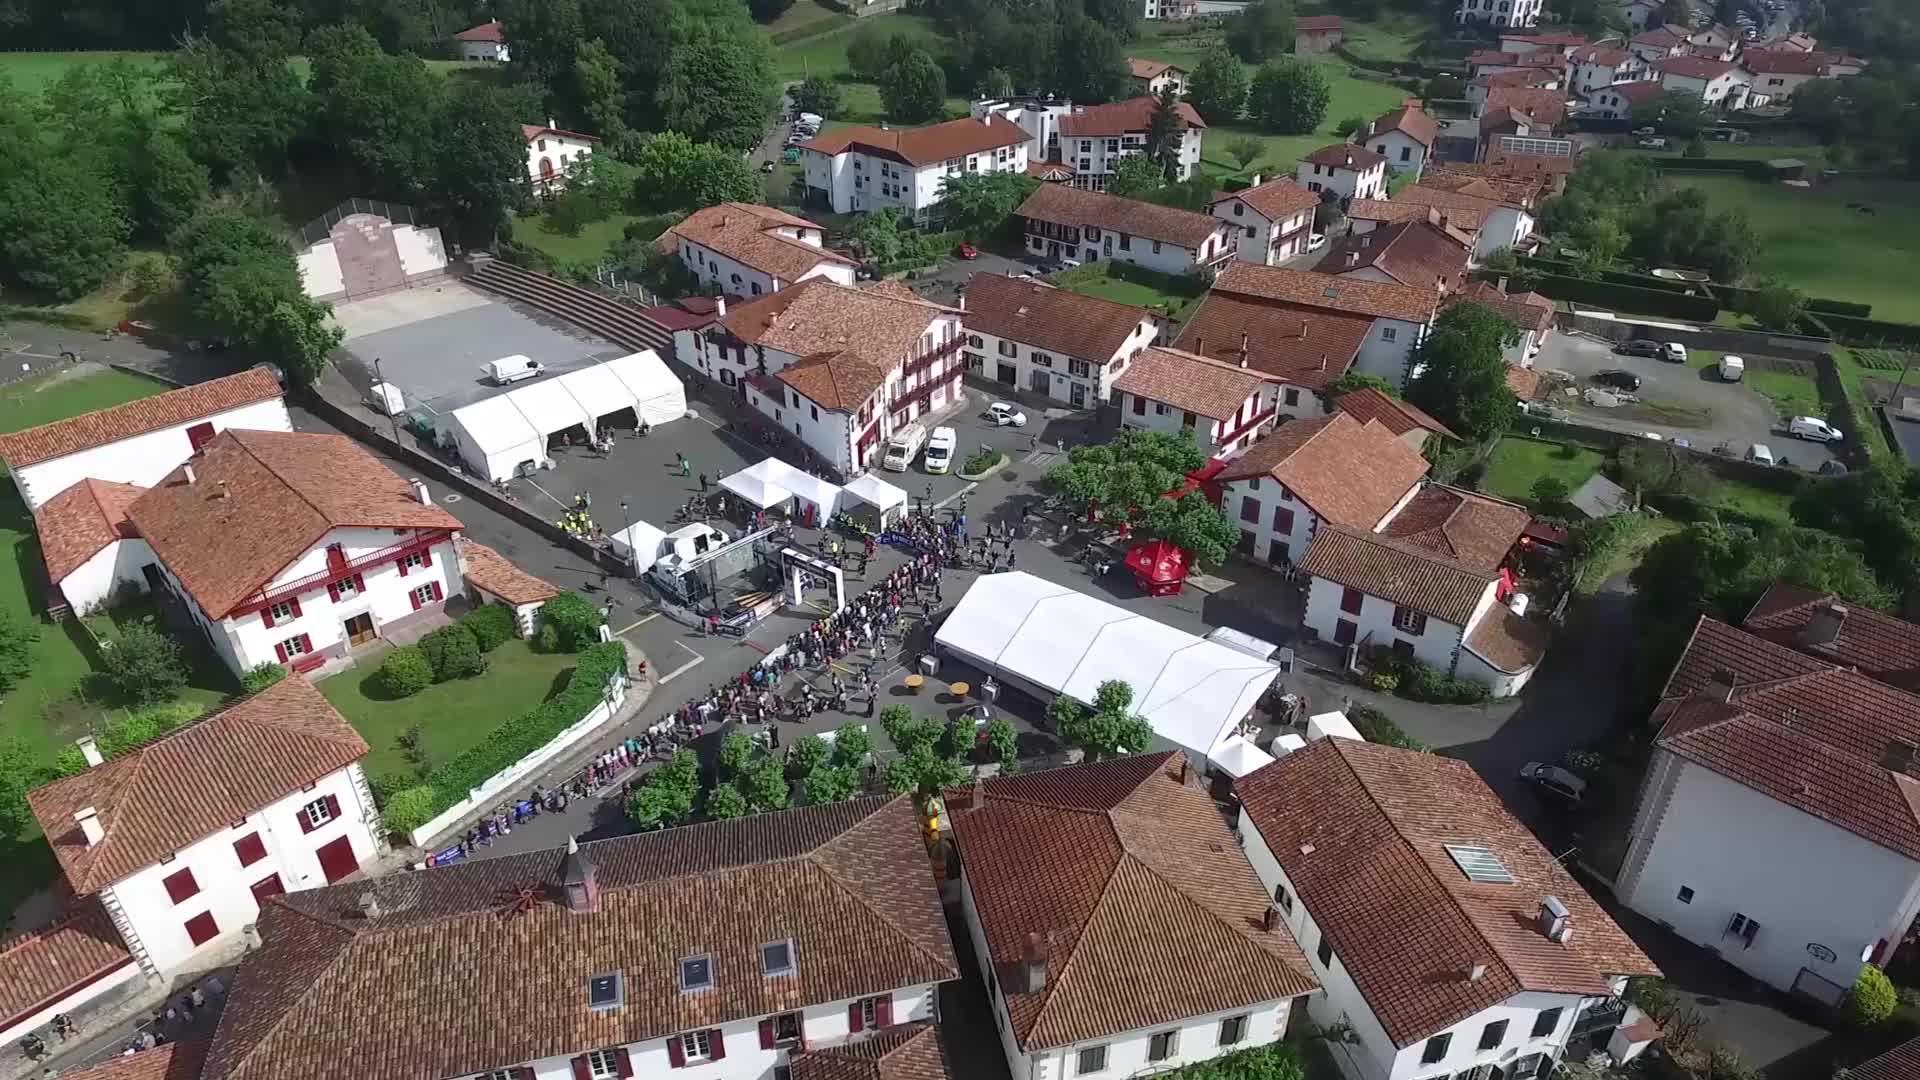 Euskal Trail 2017: Baigorrin gaindi